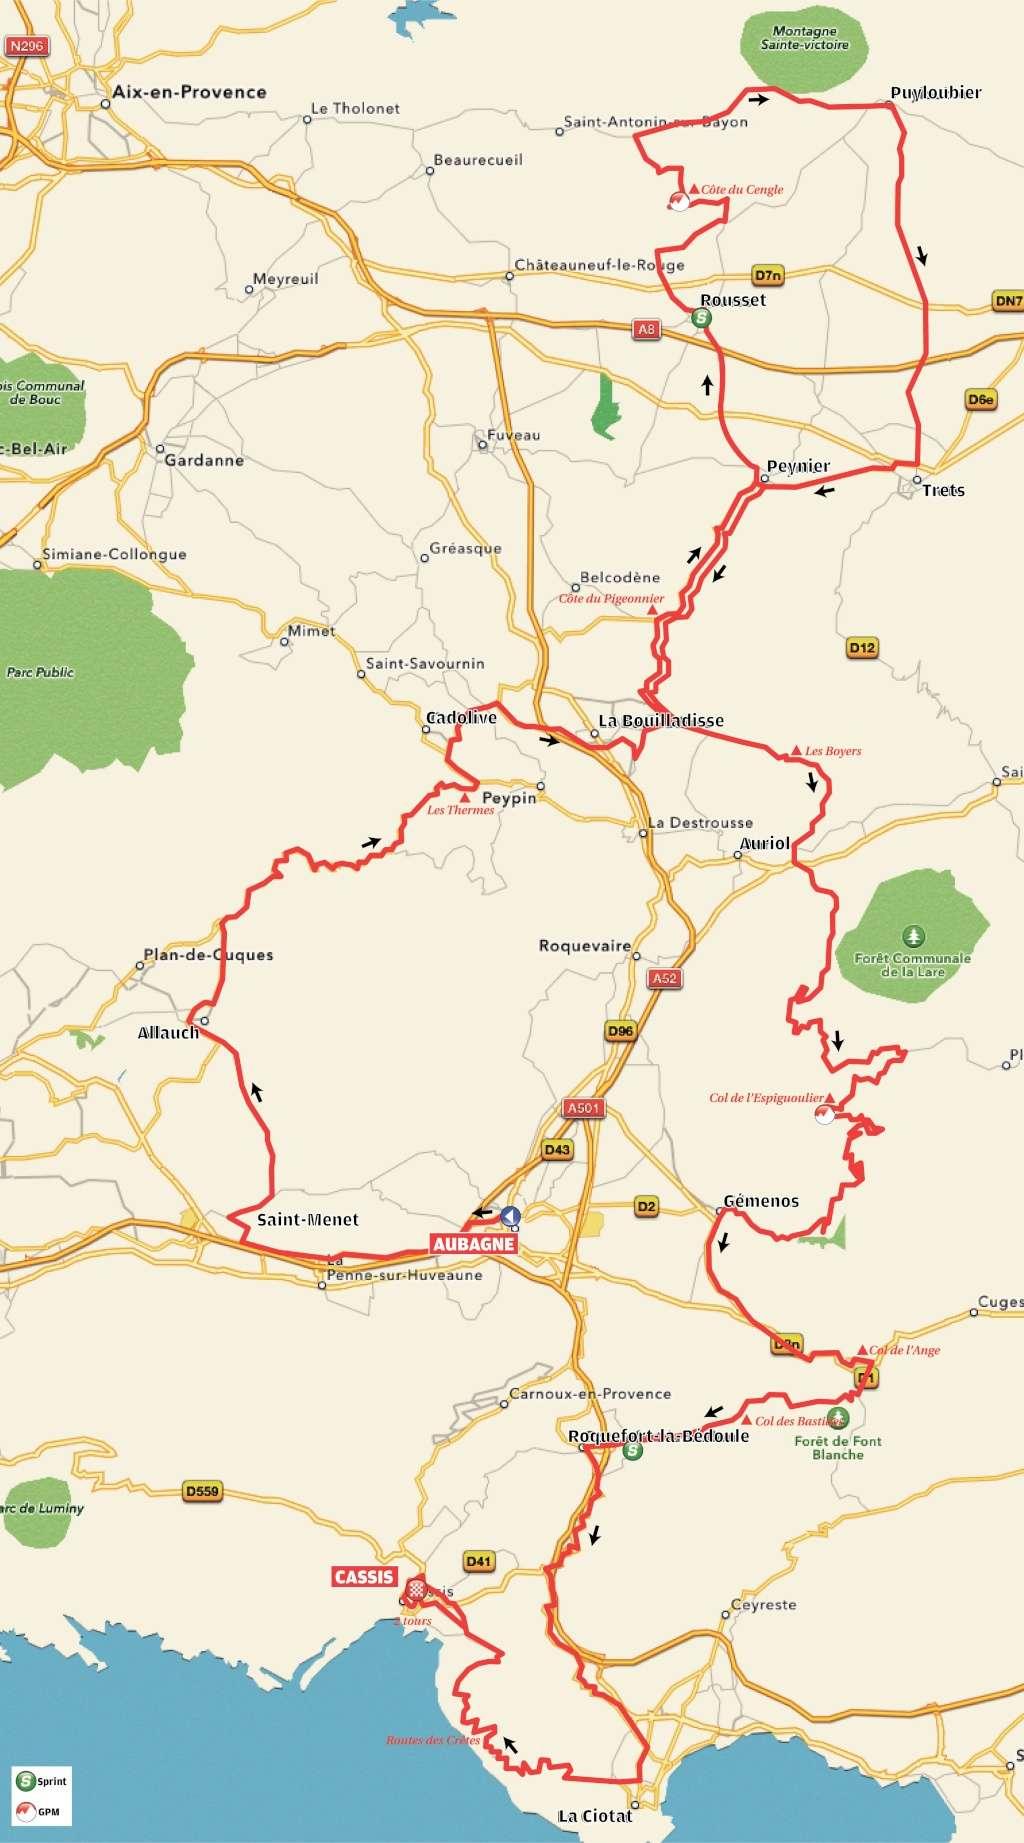 planimetria 2016 » 1st Tour Cycliste International La Provence (2.1) - 1a tappa » Aubagne › Cassis (169 km)